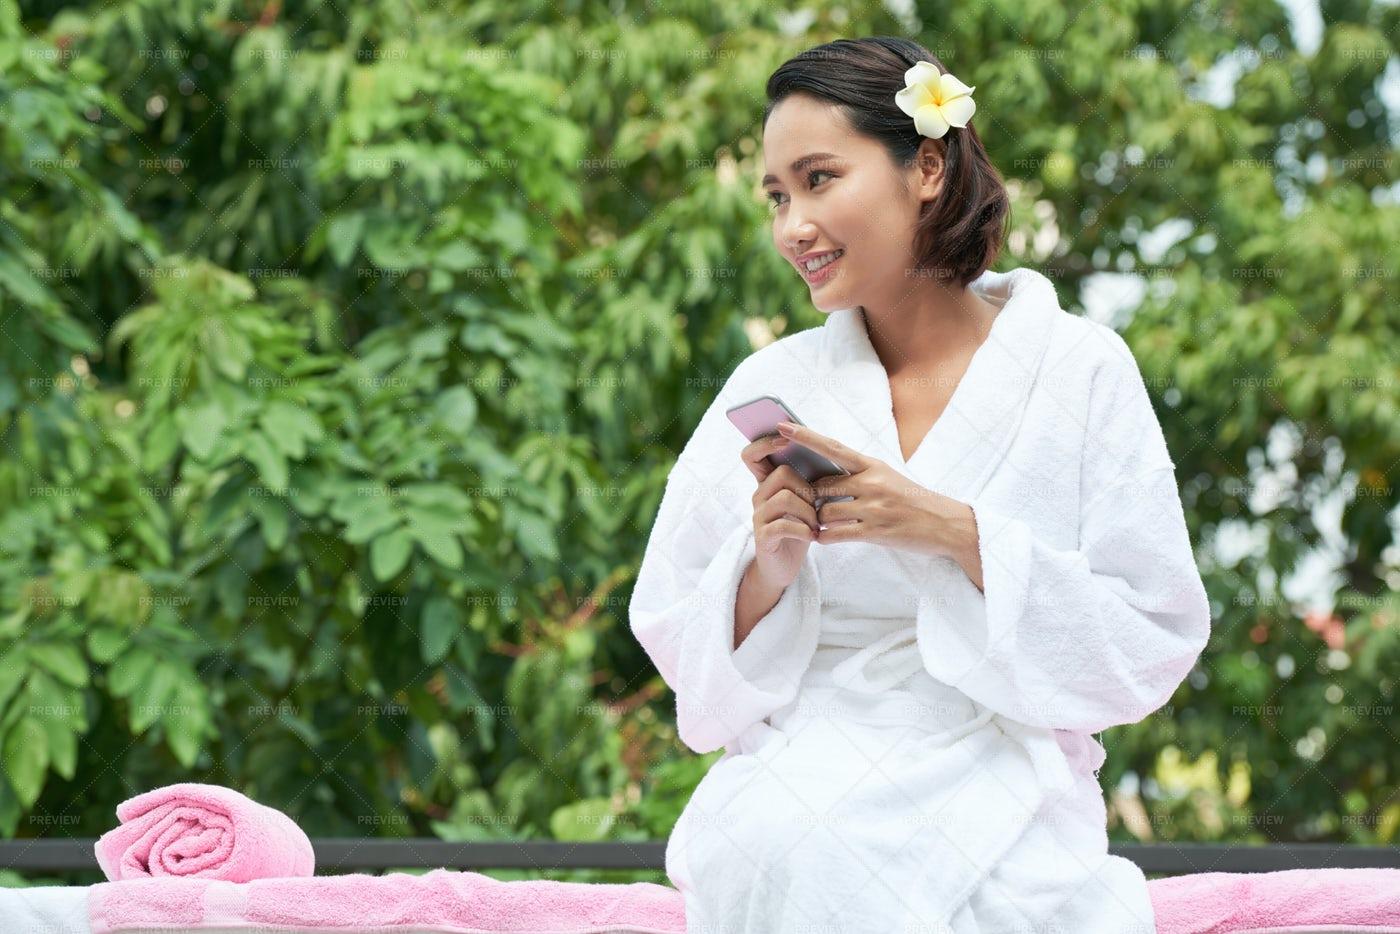 Resting On Spa Resort: Stock Photos